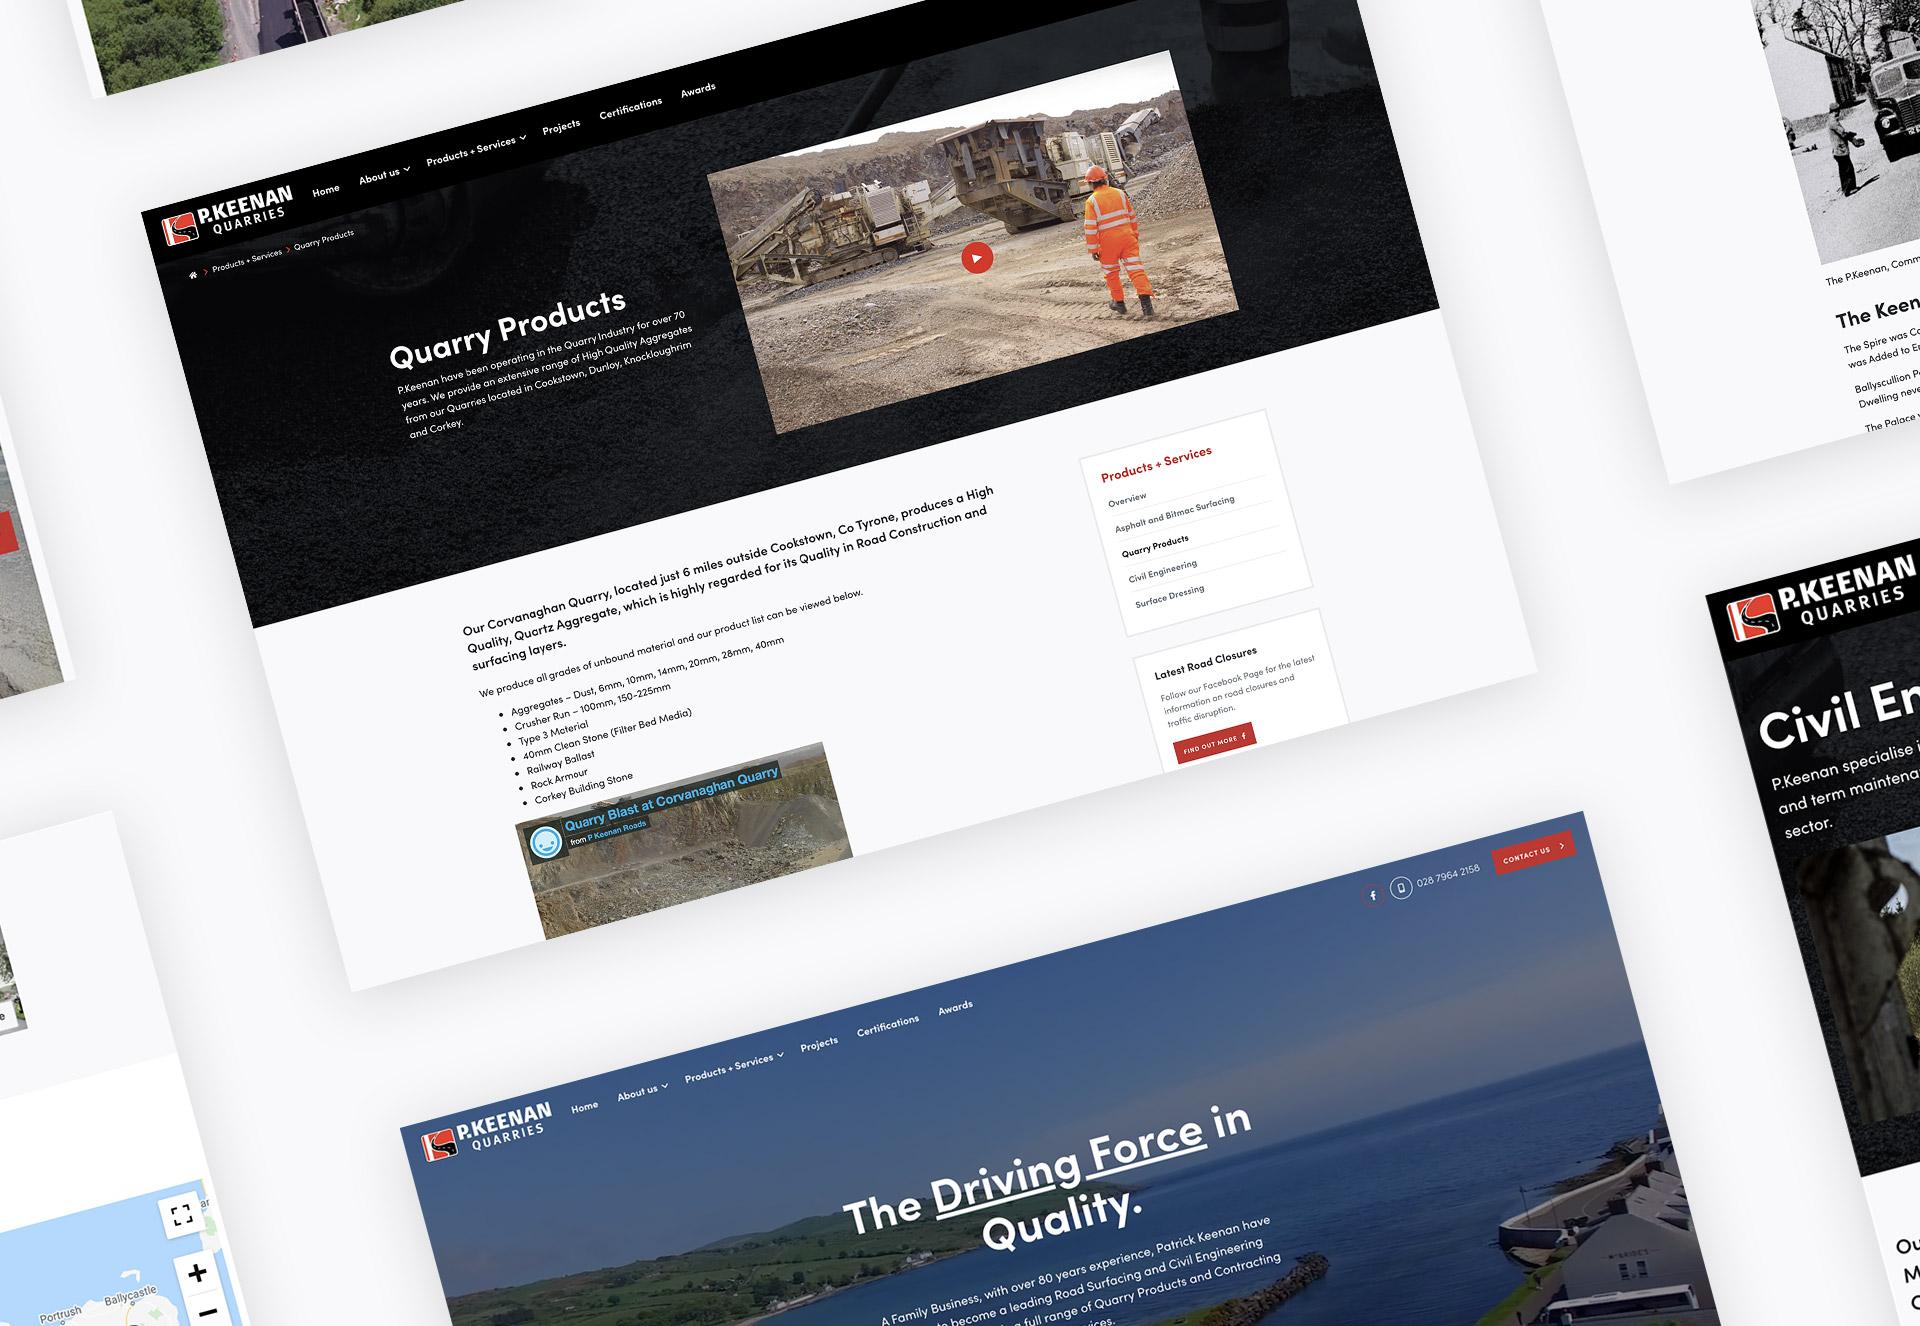 P. Keenan Website Redesign and WordPress Theme